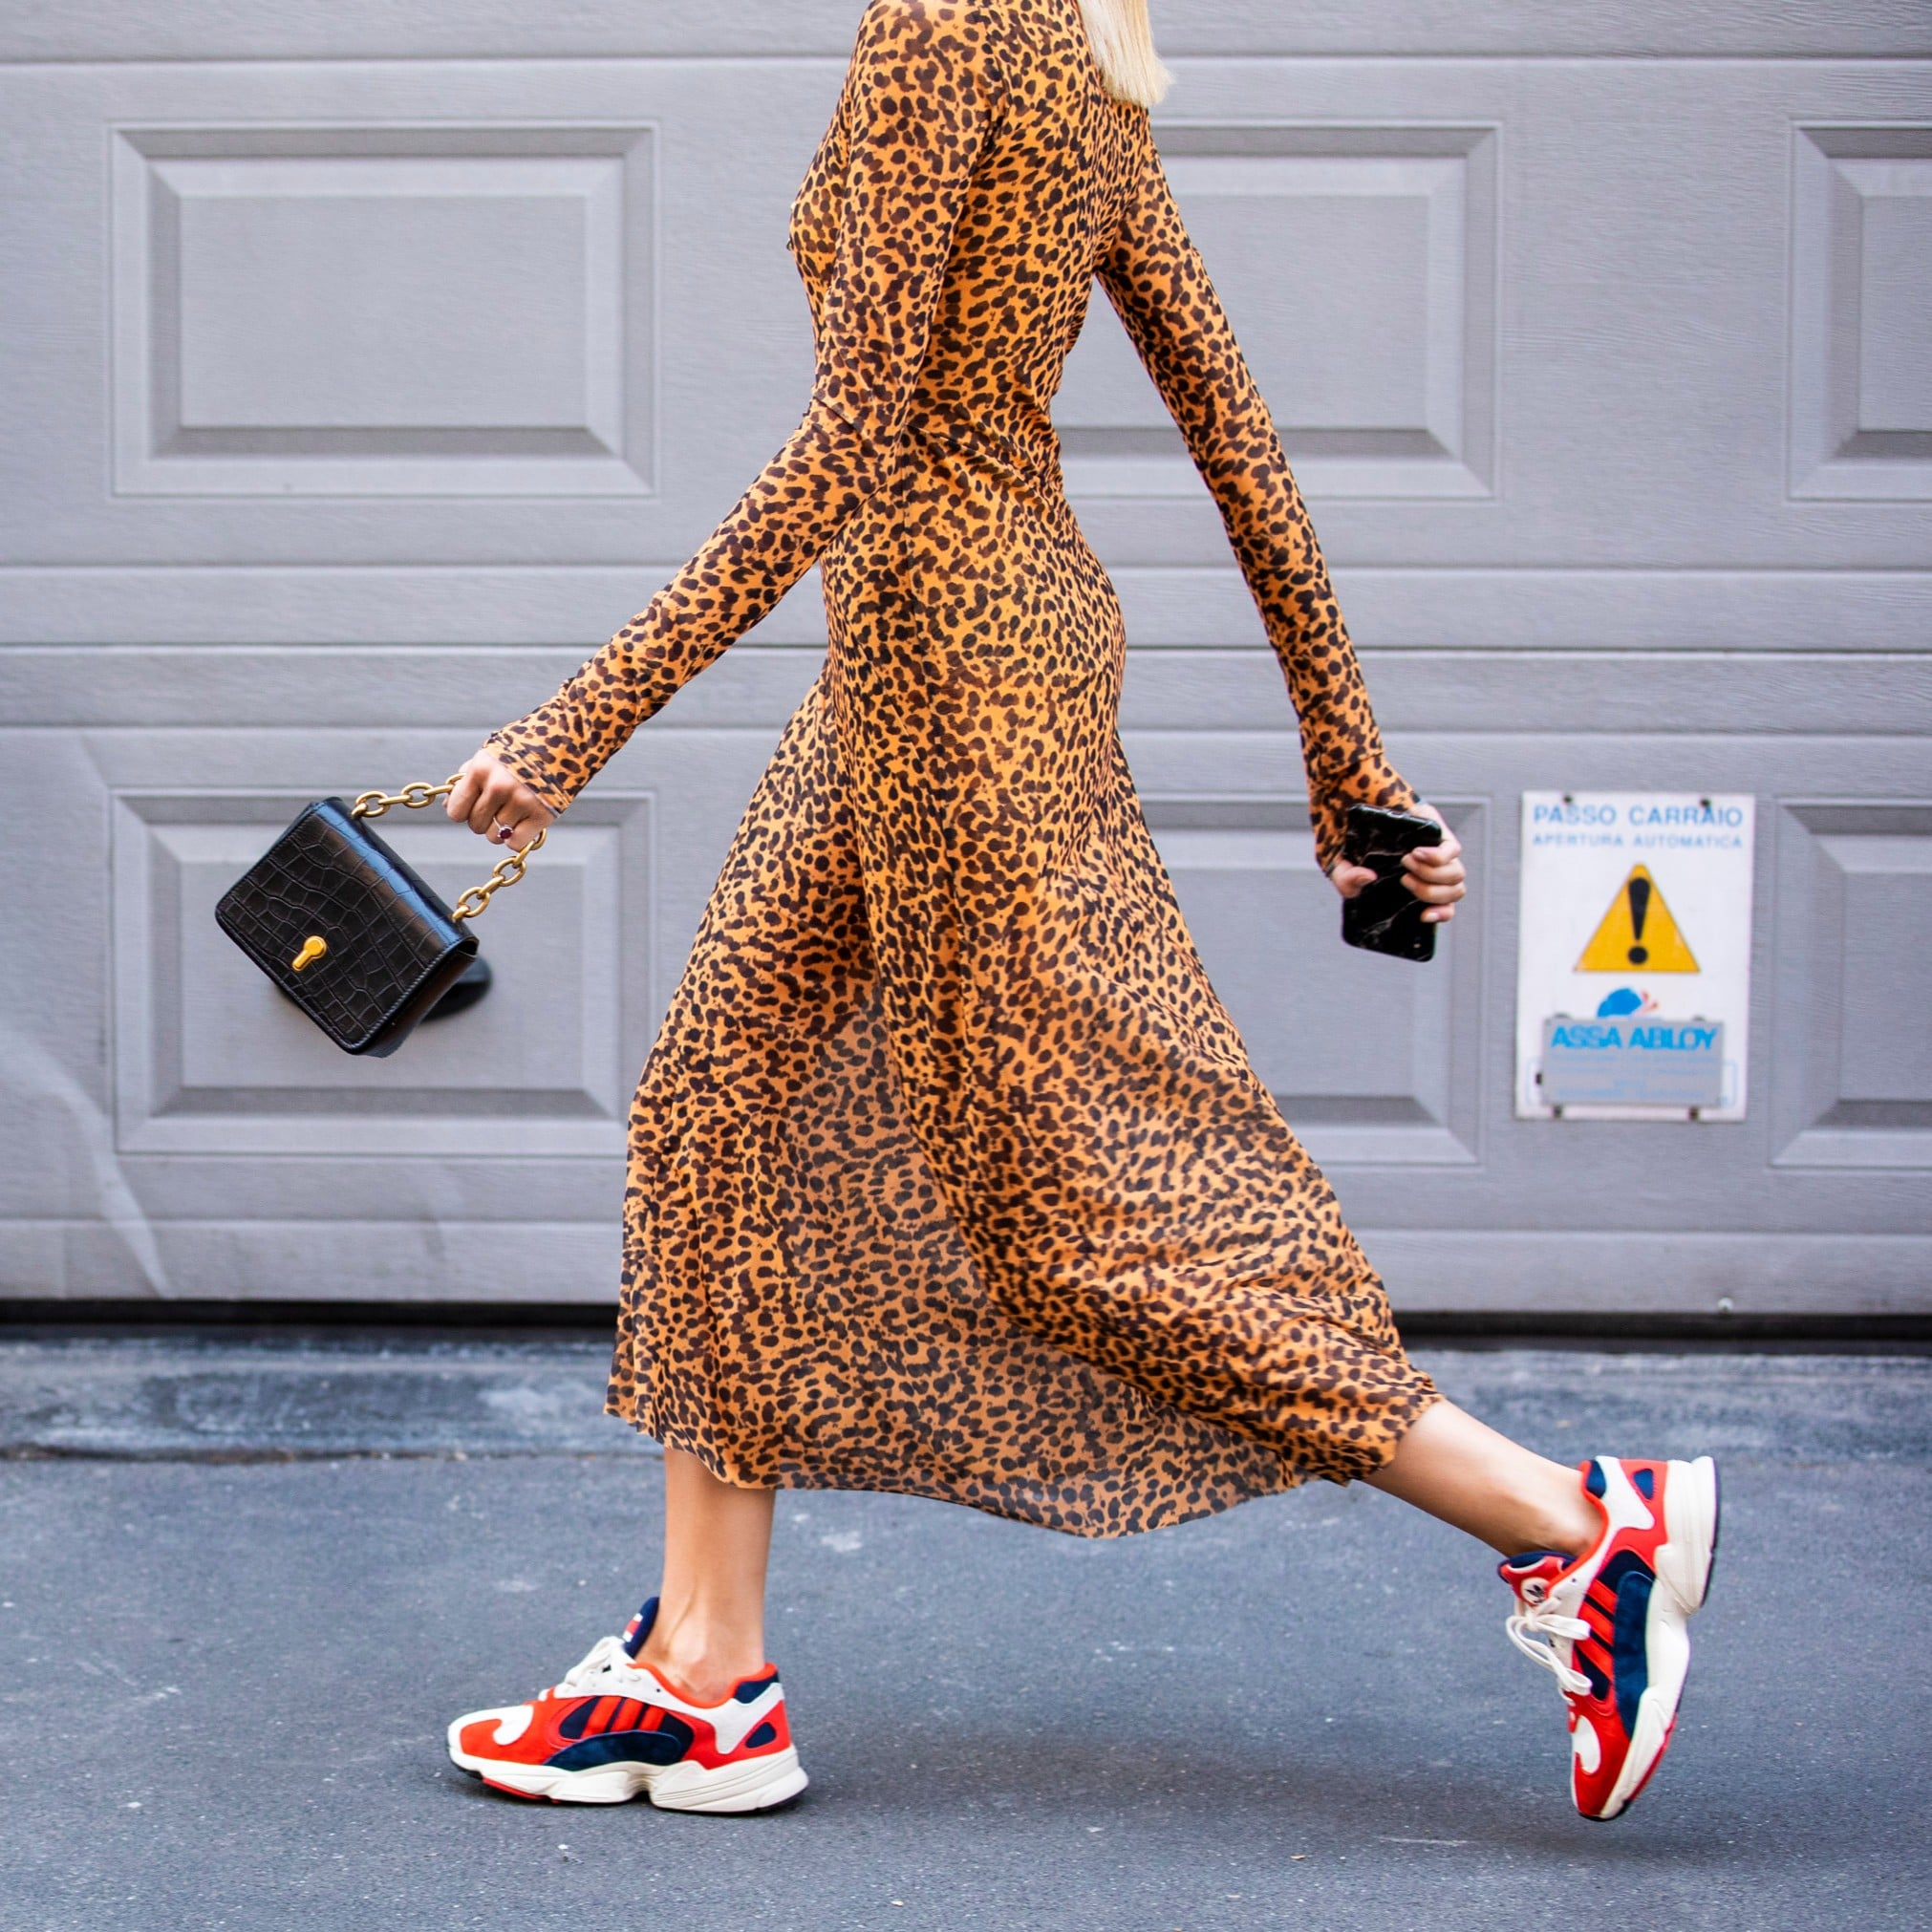 Cheap Sneakers For Women   POPSUGAR Fashion